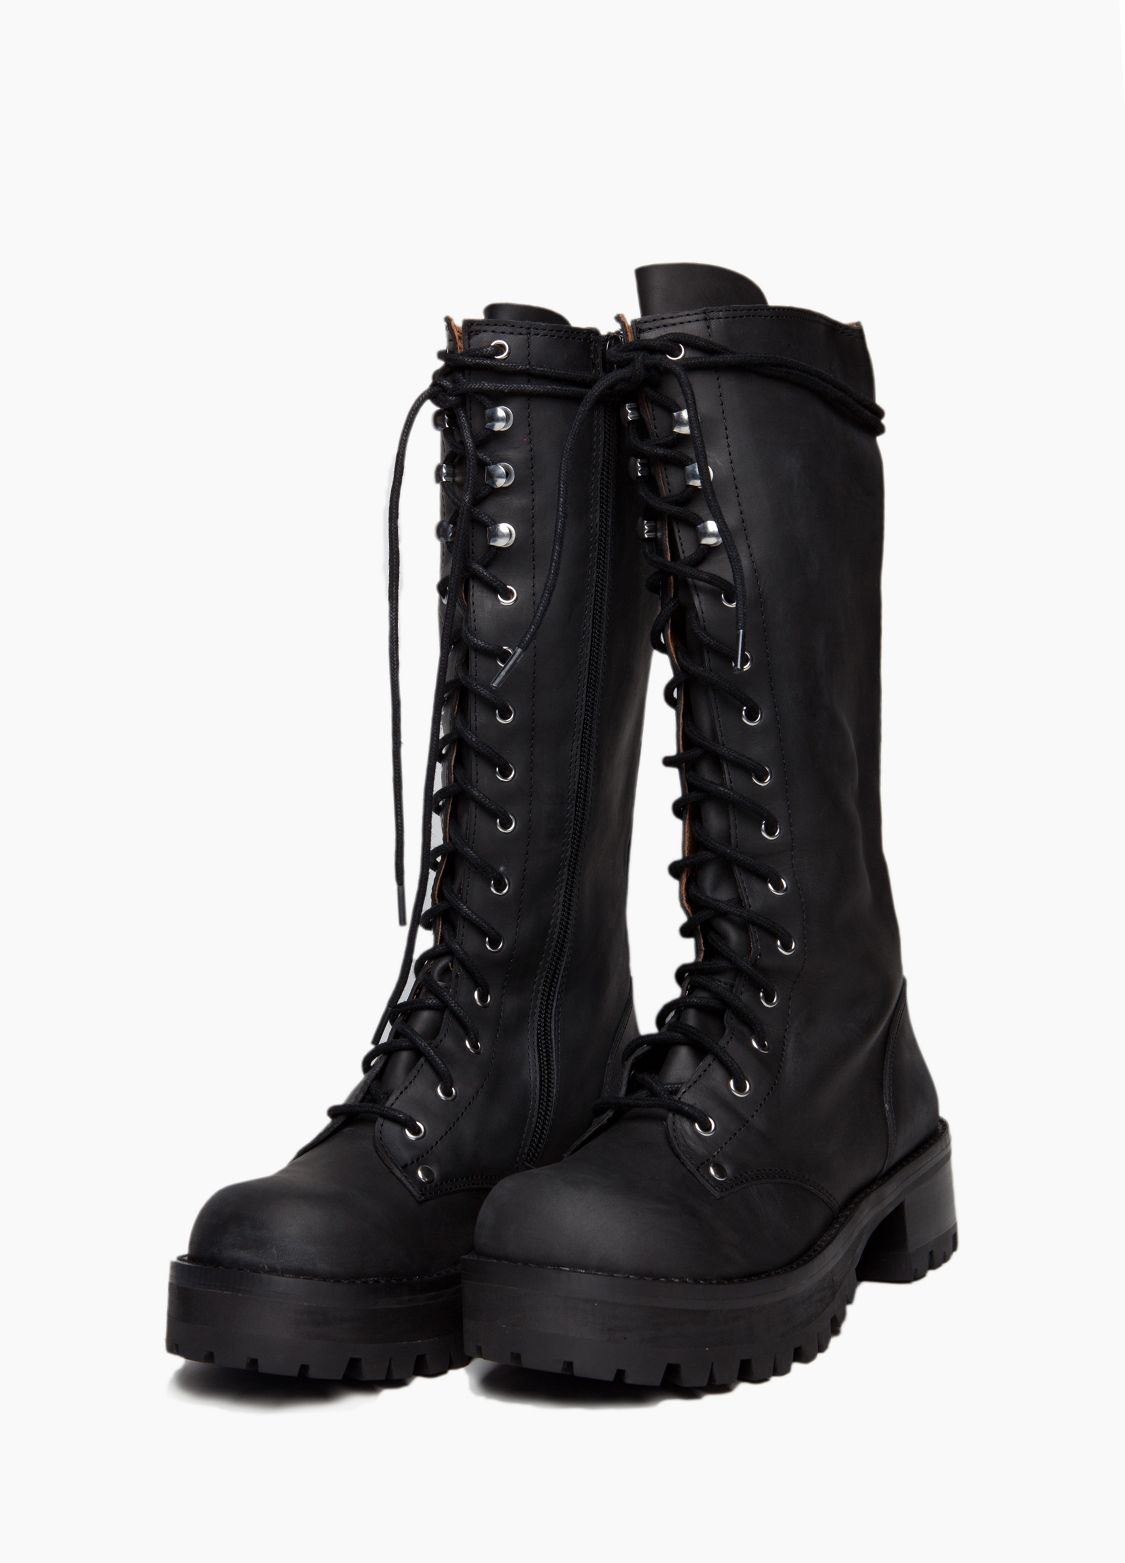 1833012f767 Wasteland Shoes - ShopWasteland.com - Jeffrey Campbell Radar Combat Boot